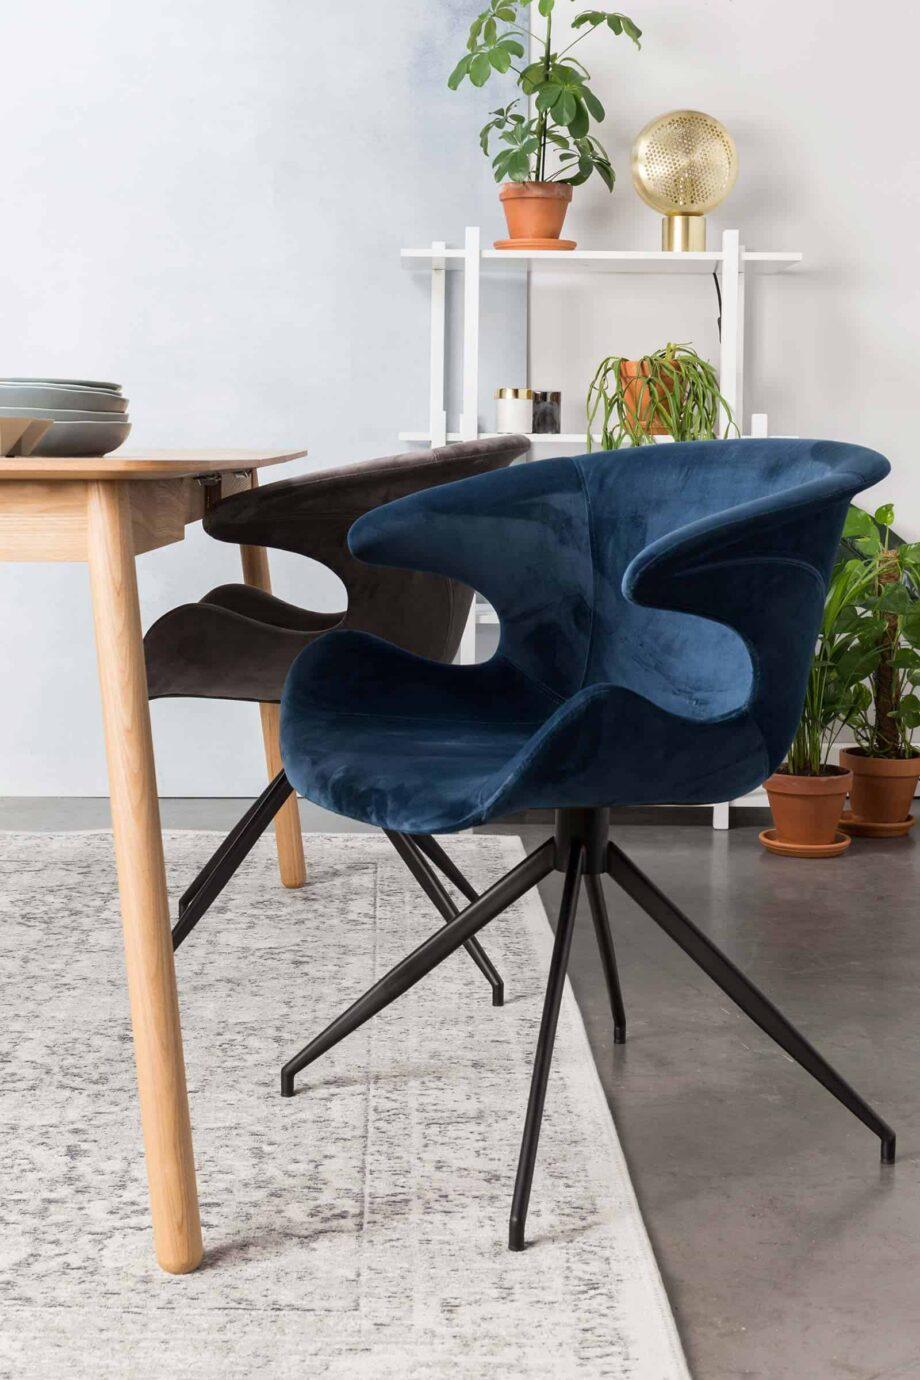 Mia fauteuil Zuiver blauw